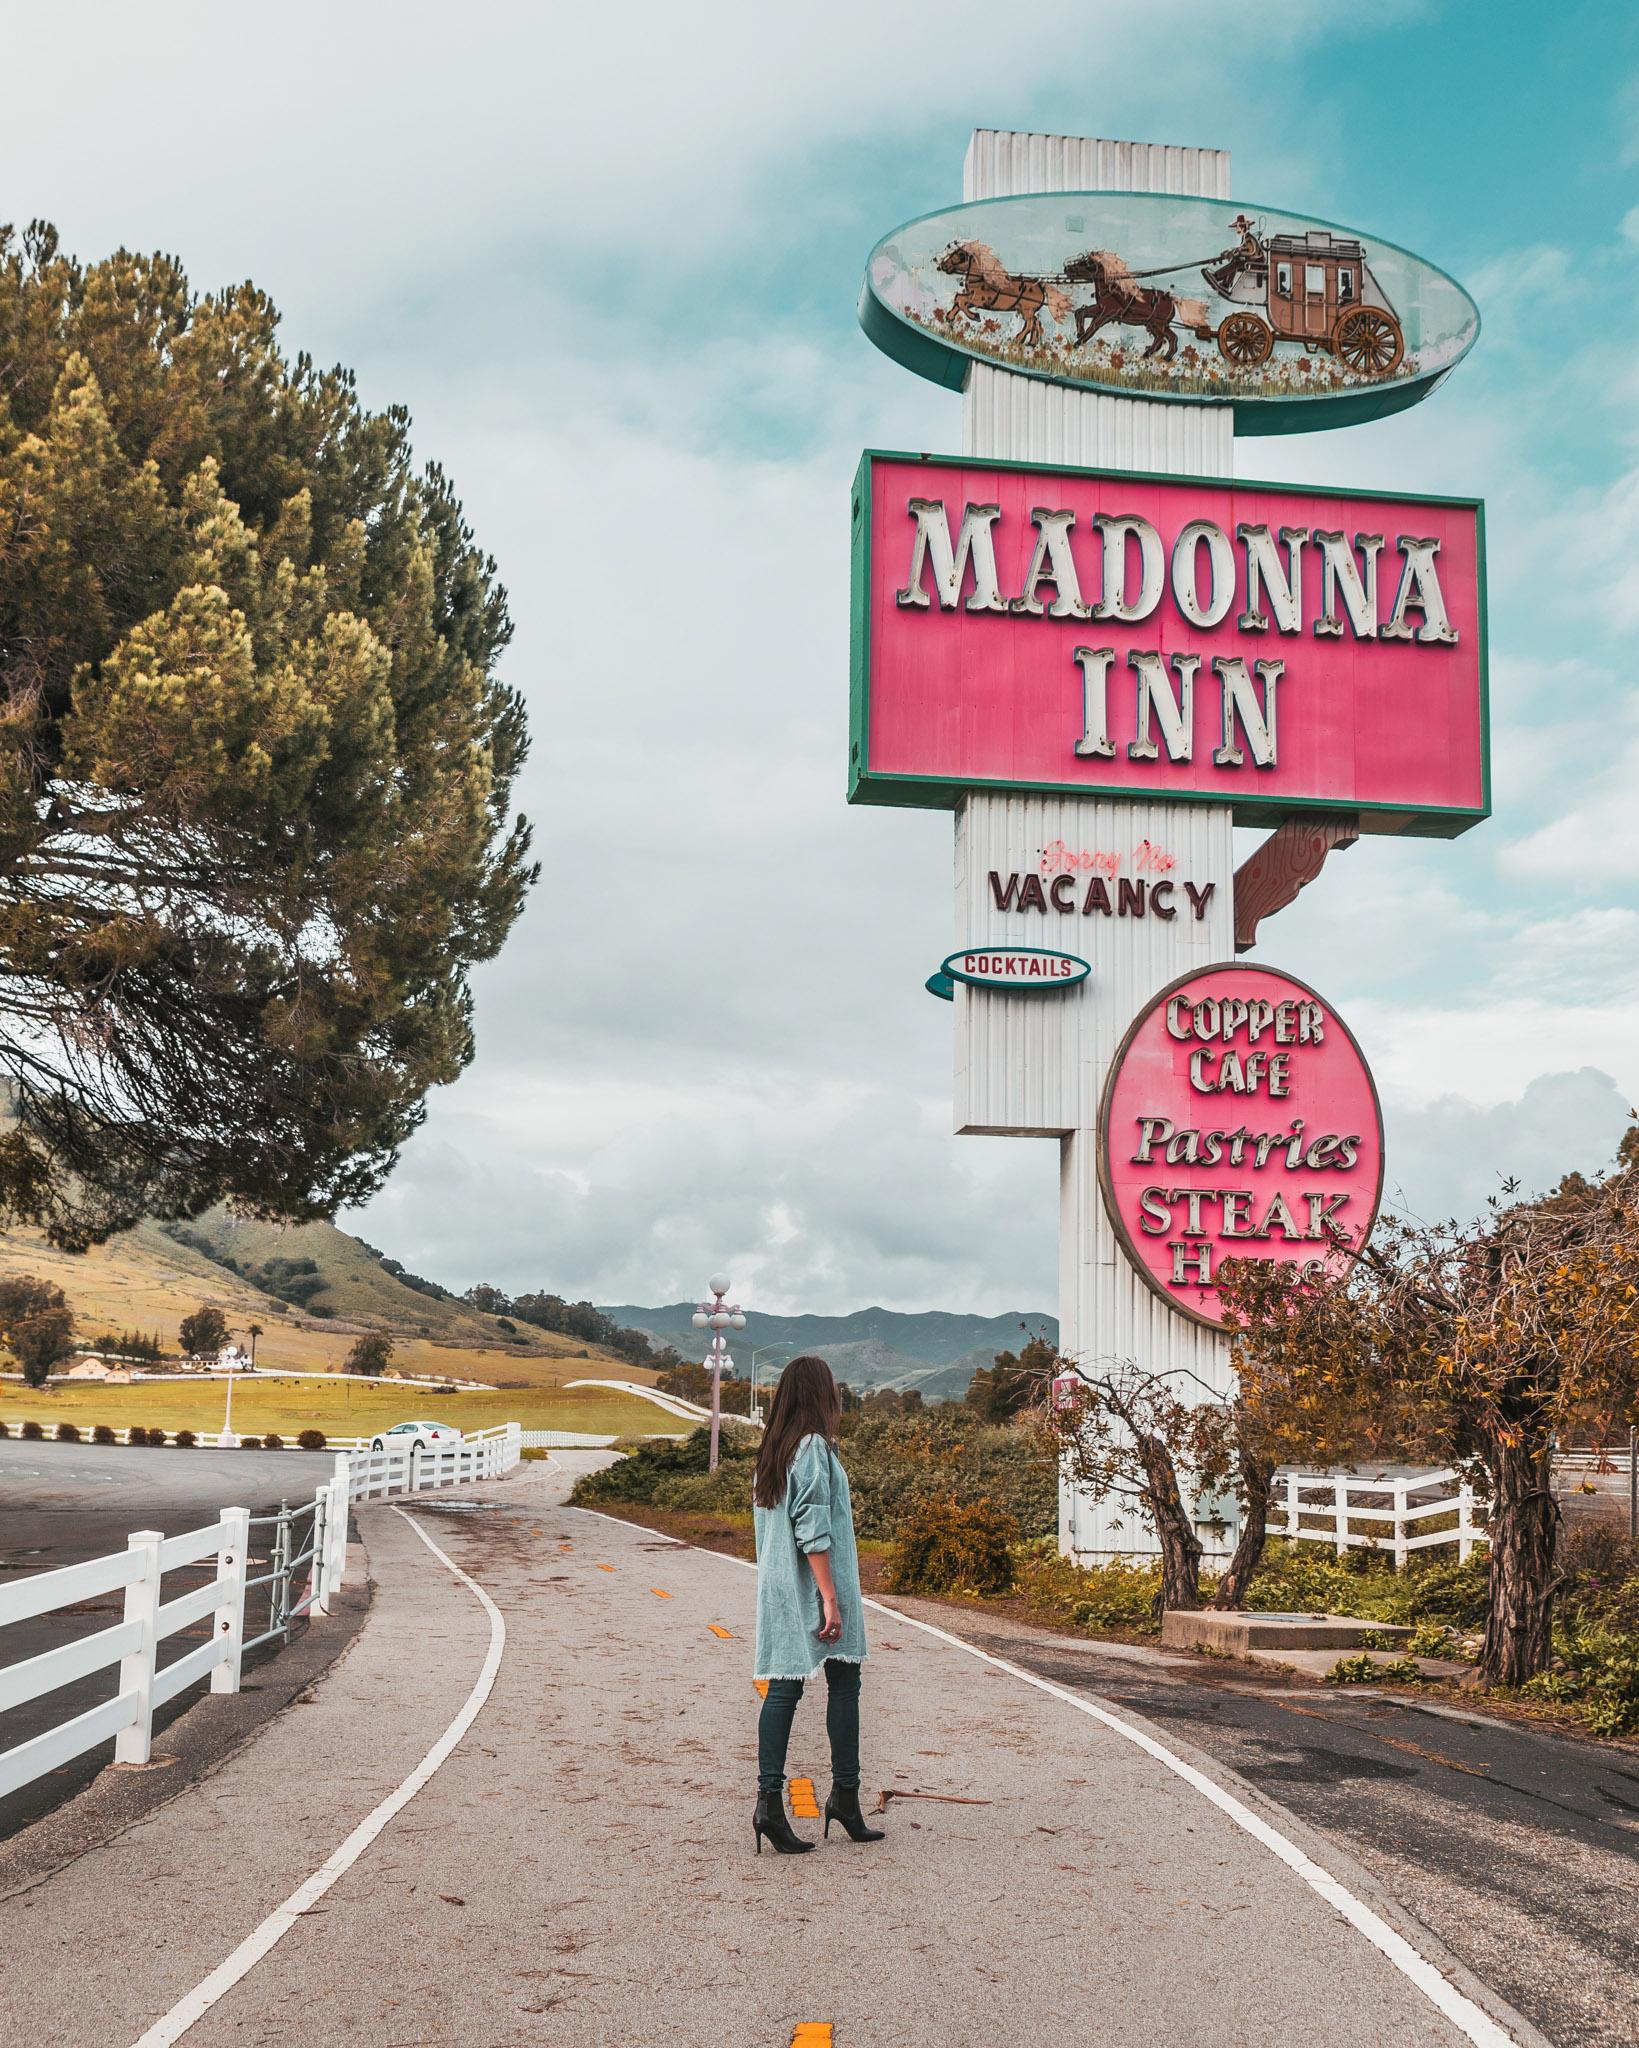 Madonna Inn sign ~ The Most Instagrammable Spots in SLO CAL County ~ #readysetjetset #slocal #california #blogpost #travel #sanluisobispo